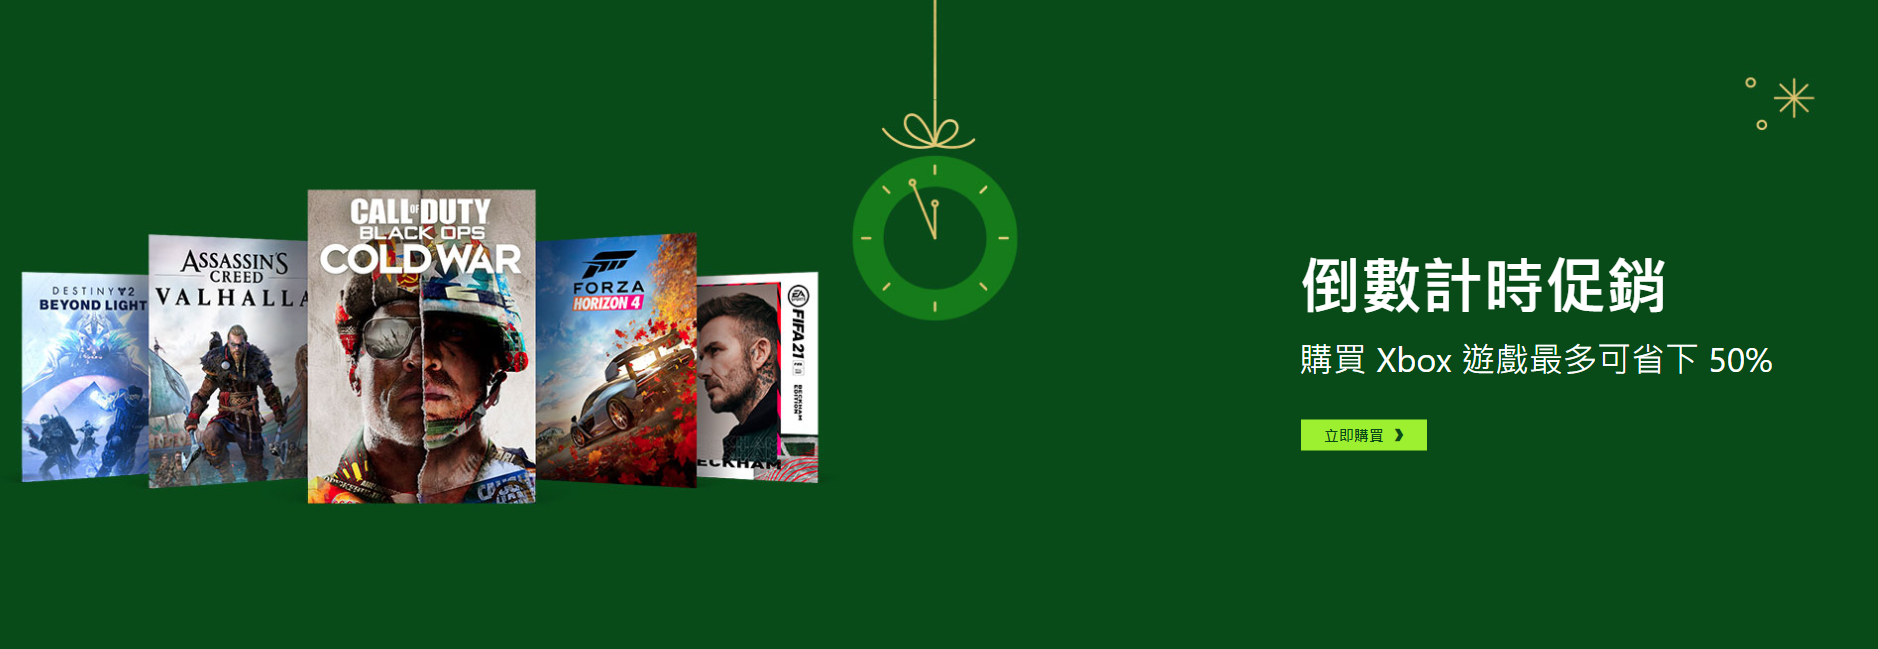 Xbox港服特惠开启 《看门狗:军团》等作品优惠中